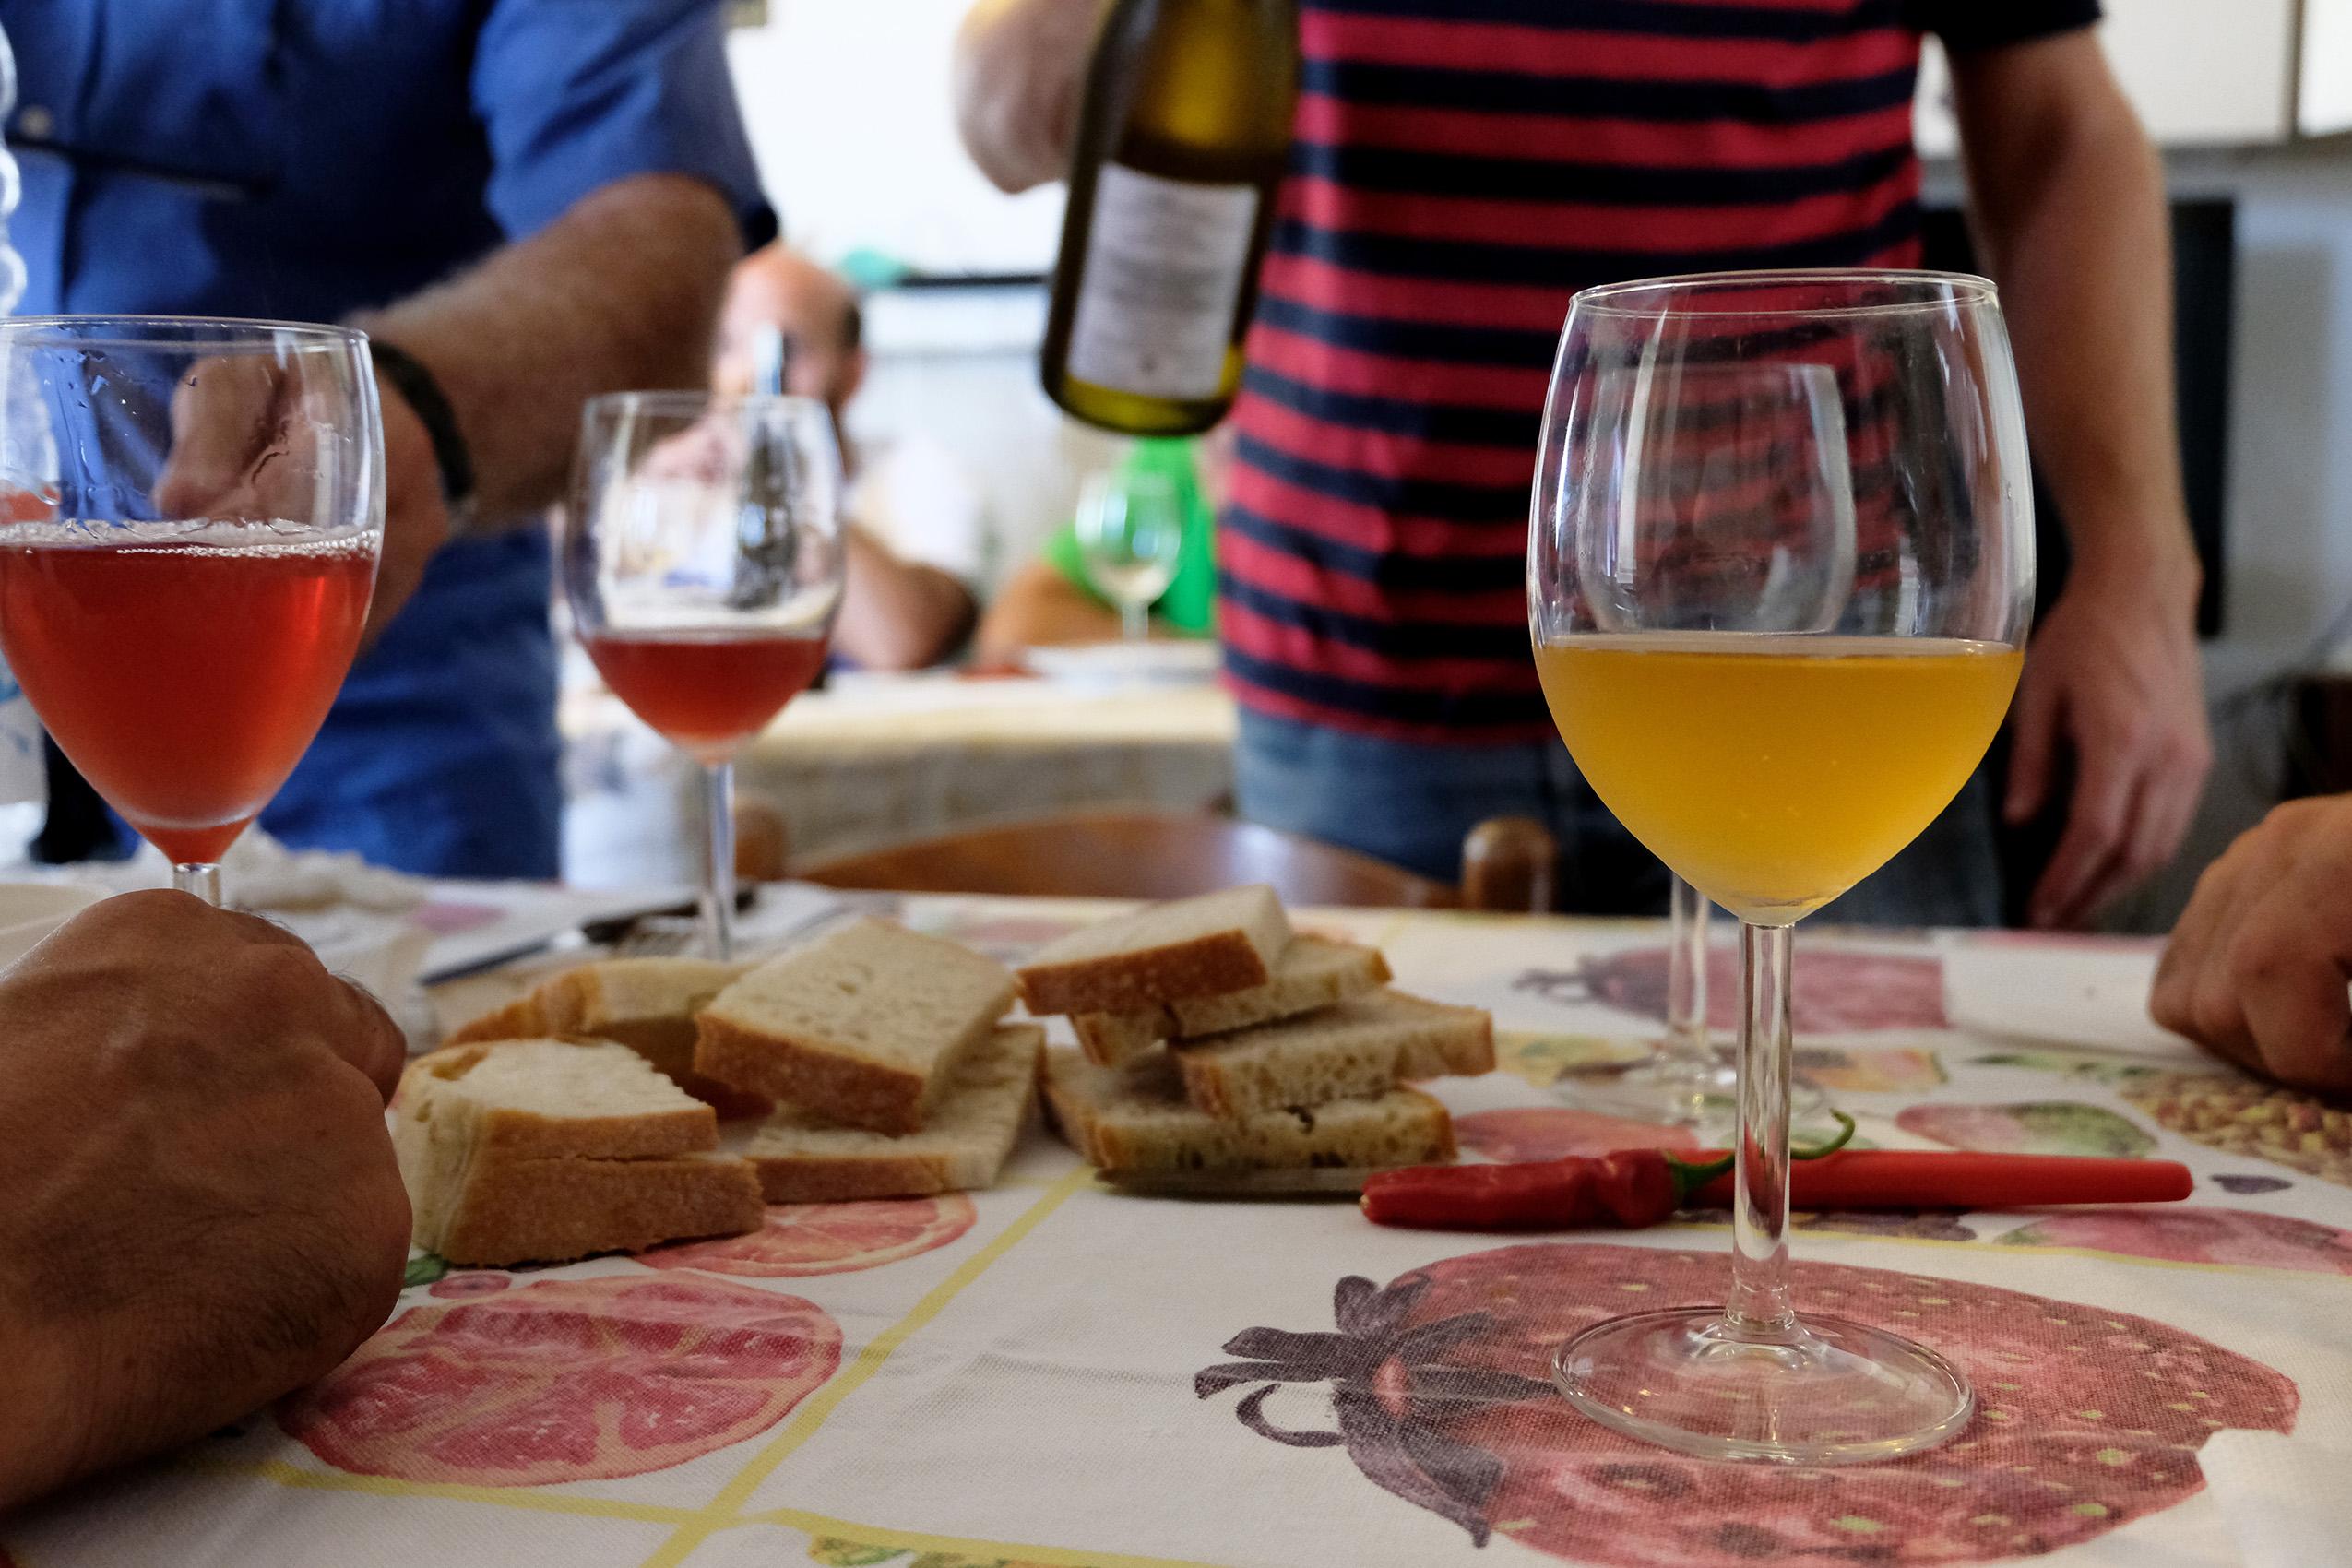 Vini Lammidia abruzzo